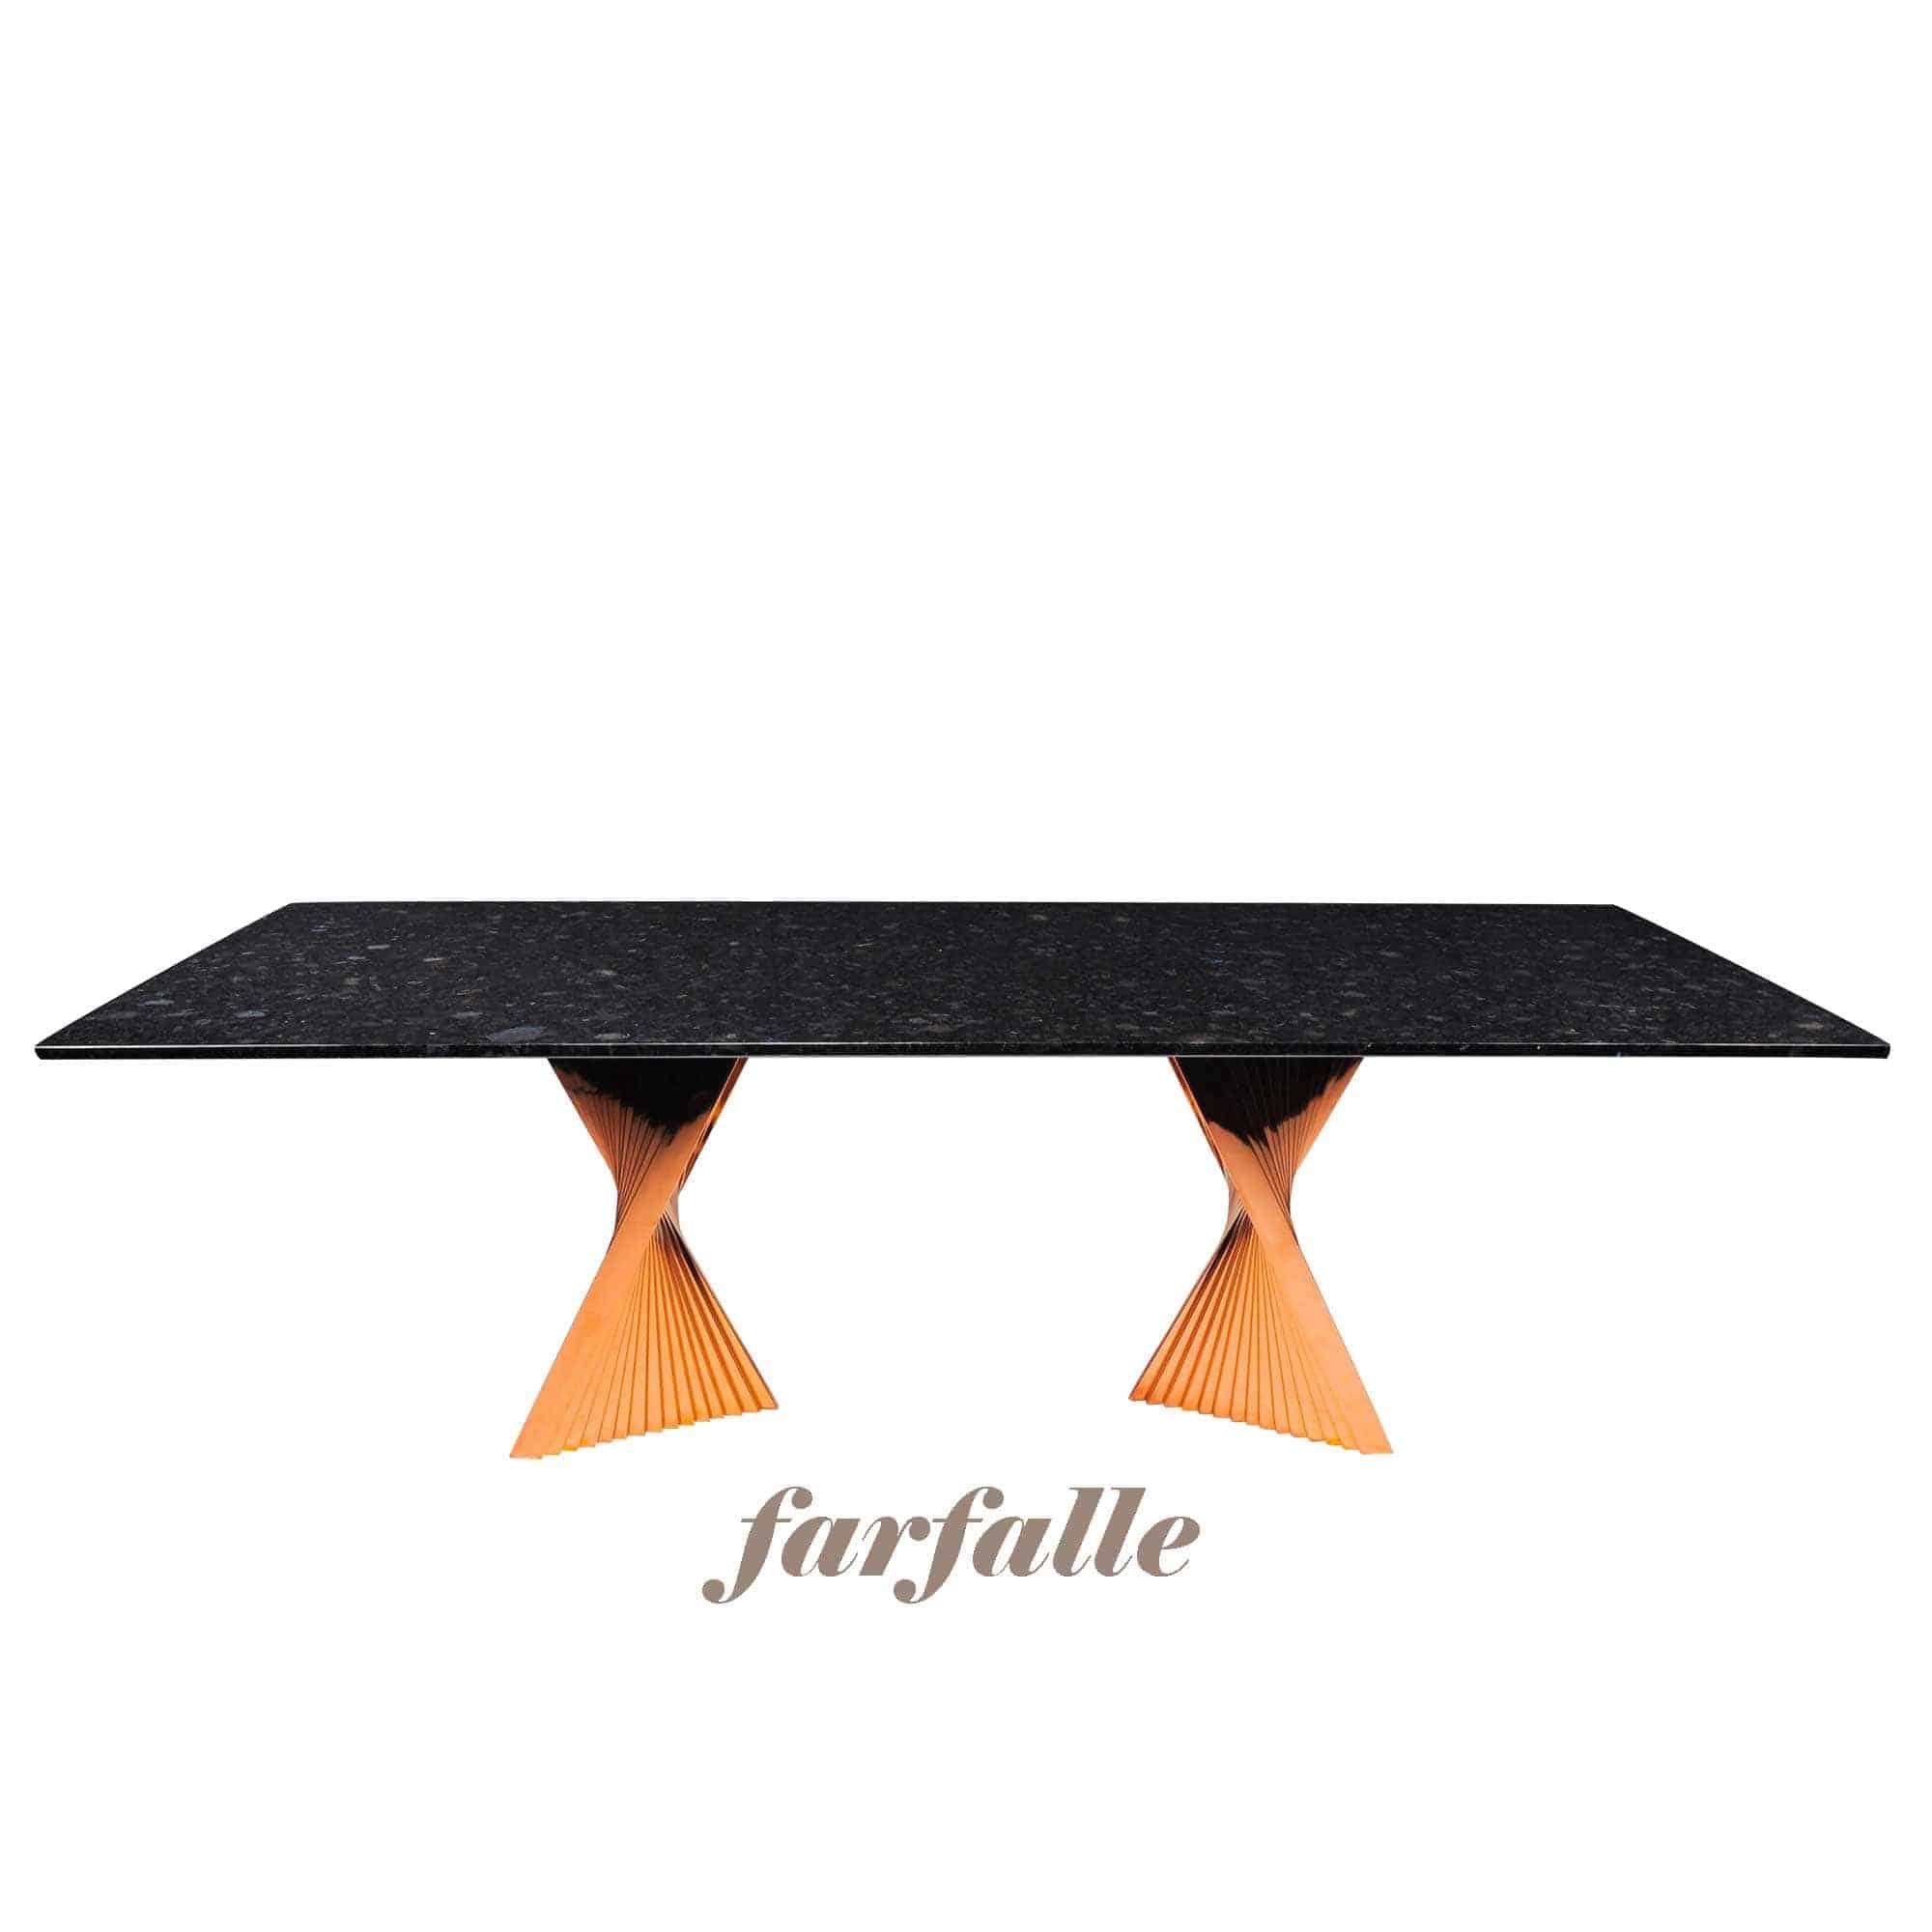 galatica-black-rectangular-granite-dining-table-8-to-10-pax-decasa-marble-2400x1100mm-farfalle-rg